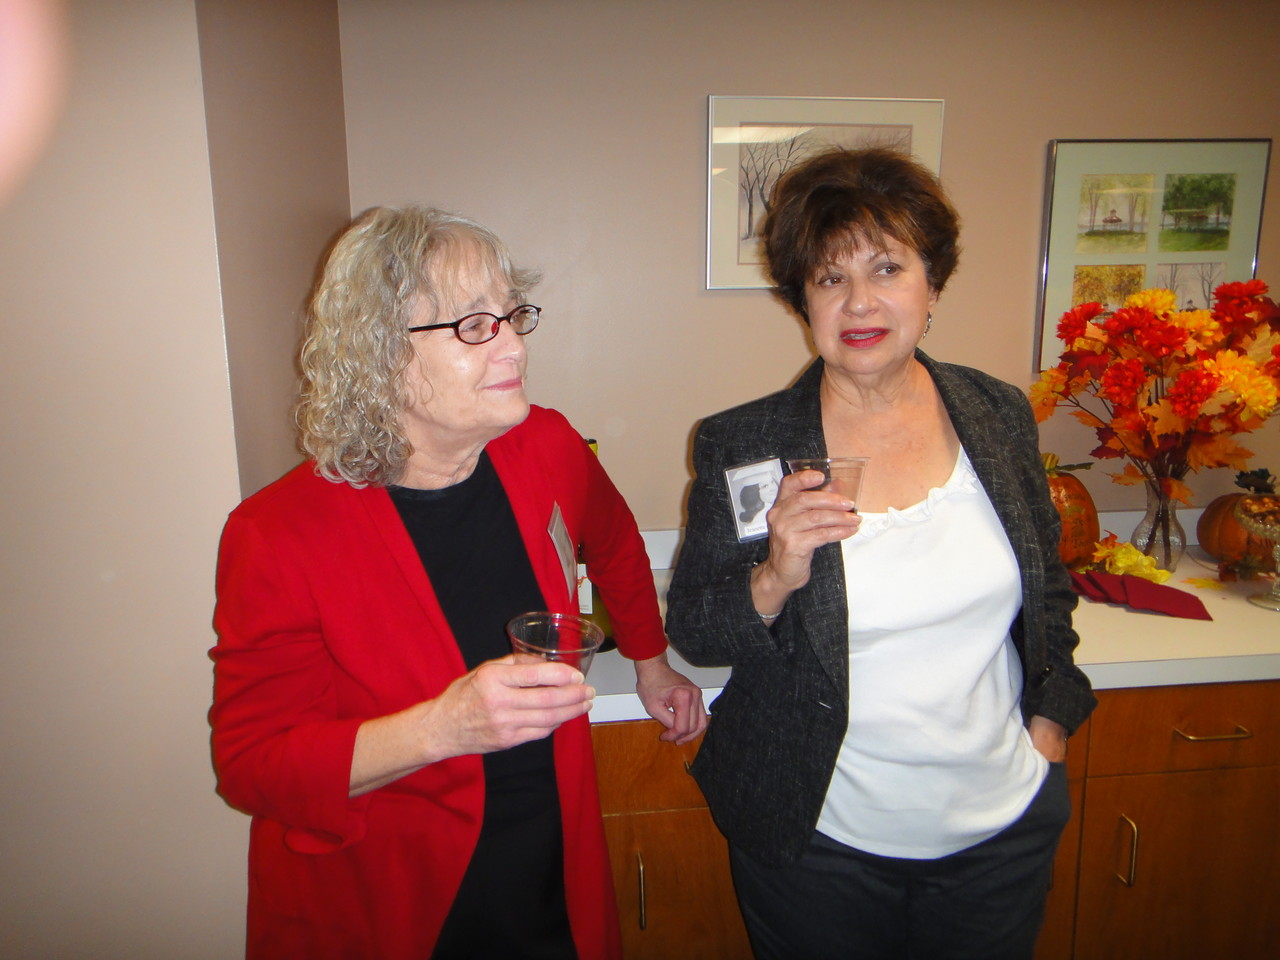 Barb Slater & Jeanette Santaro